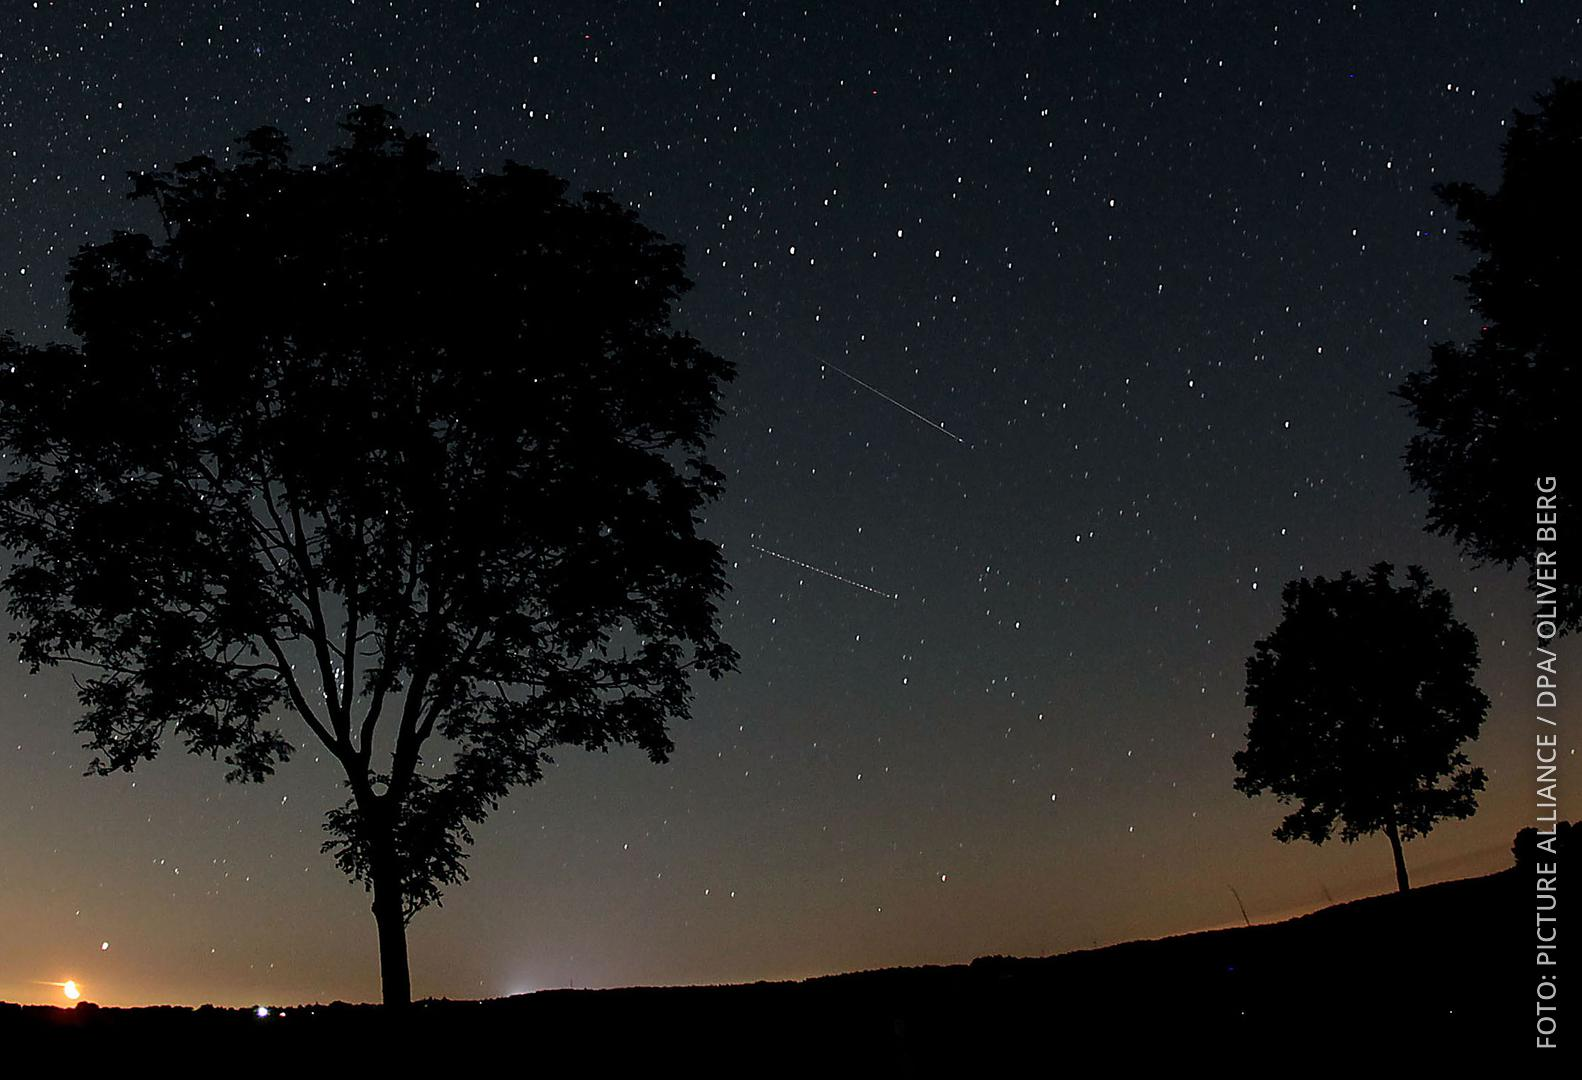 Sternenhimmel im Nationalpark Eifel